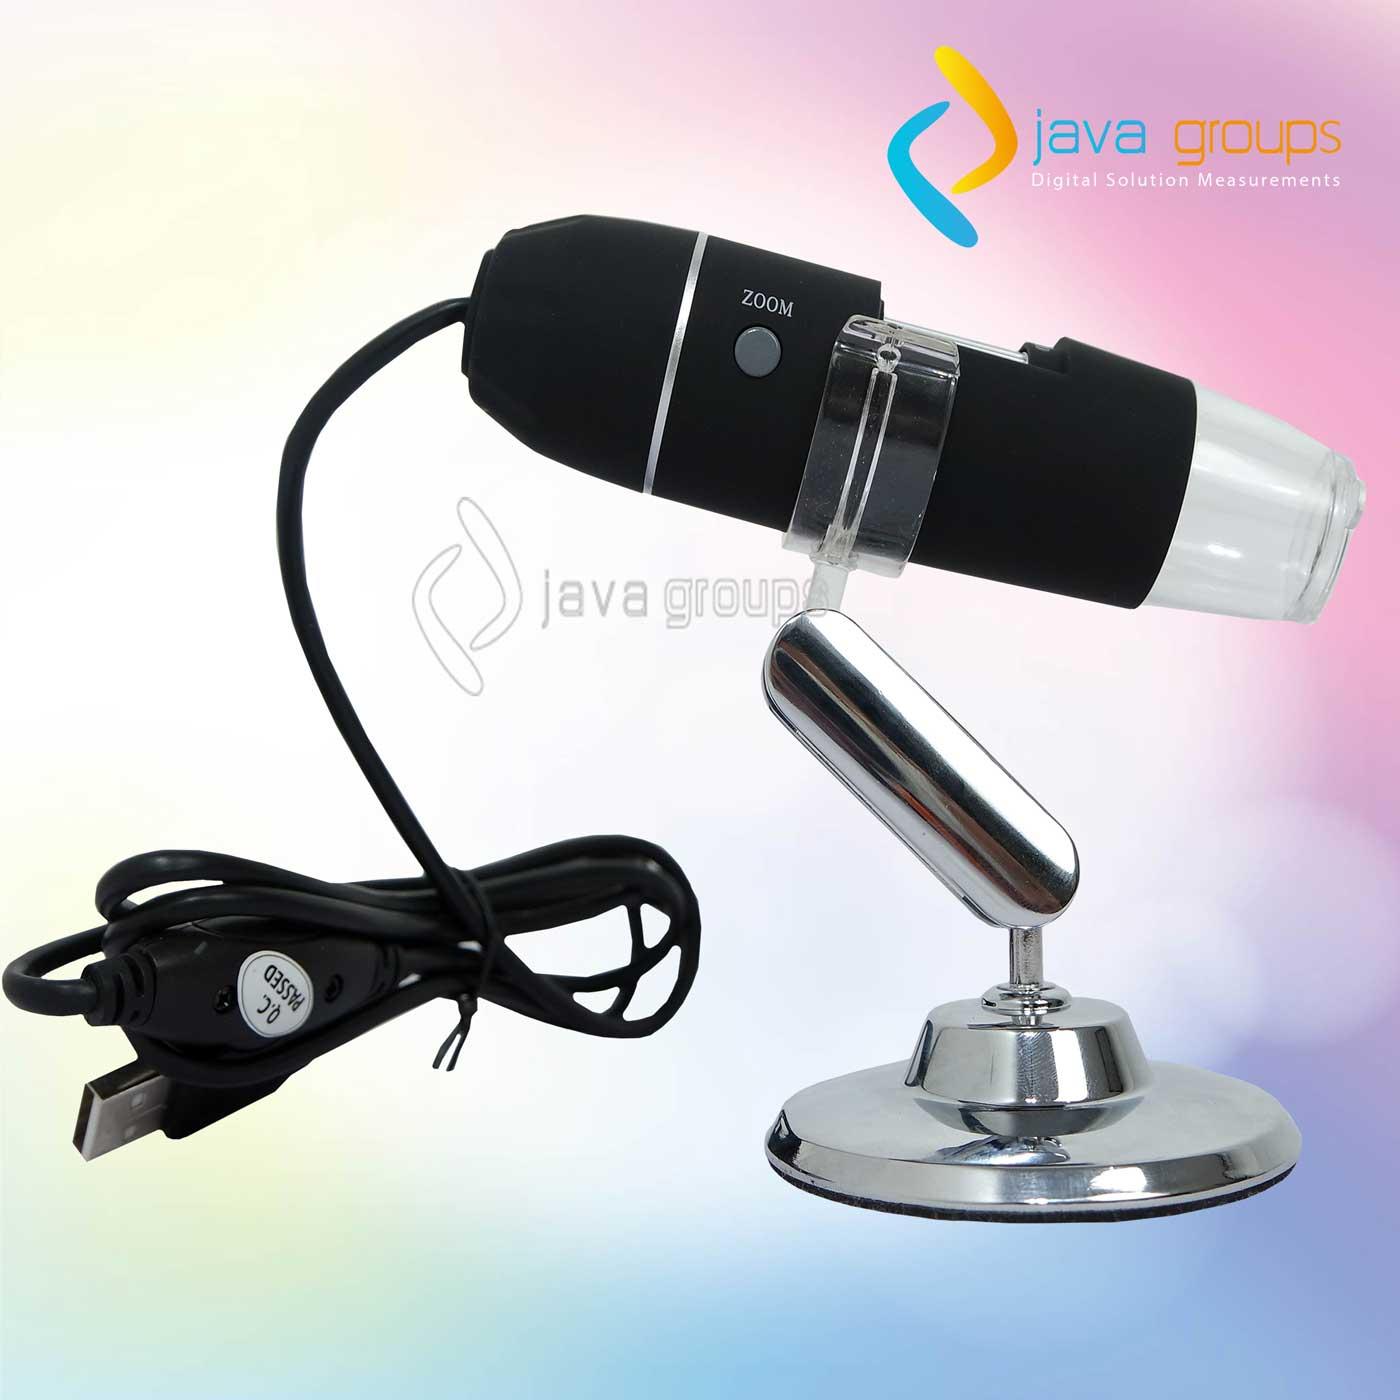 Alat Ukur Digital Mikroskop CY-200B